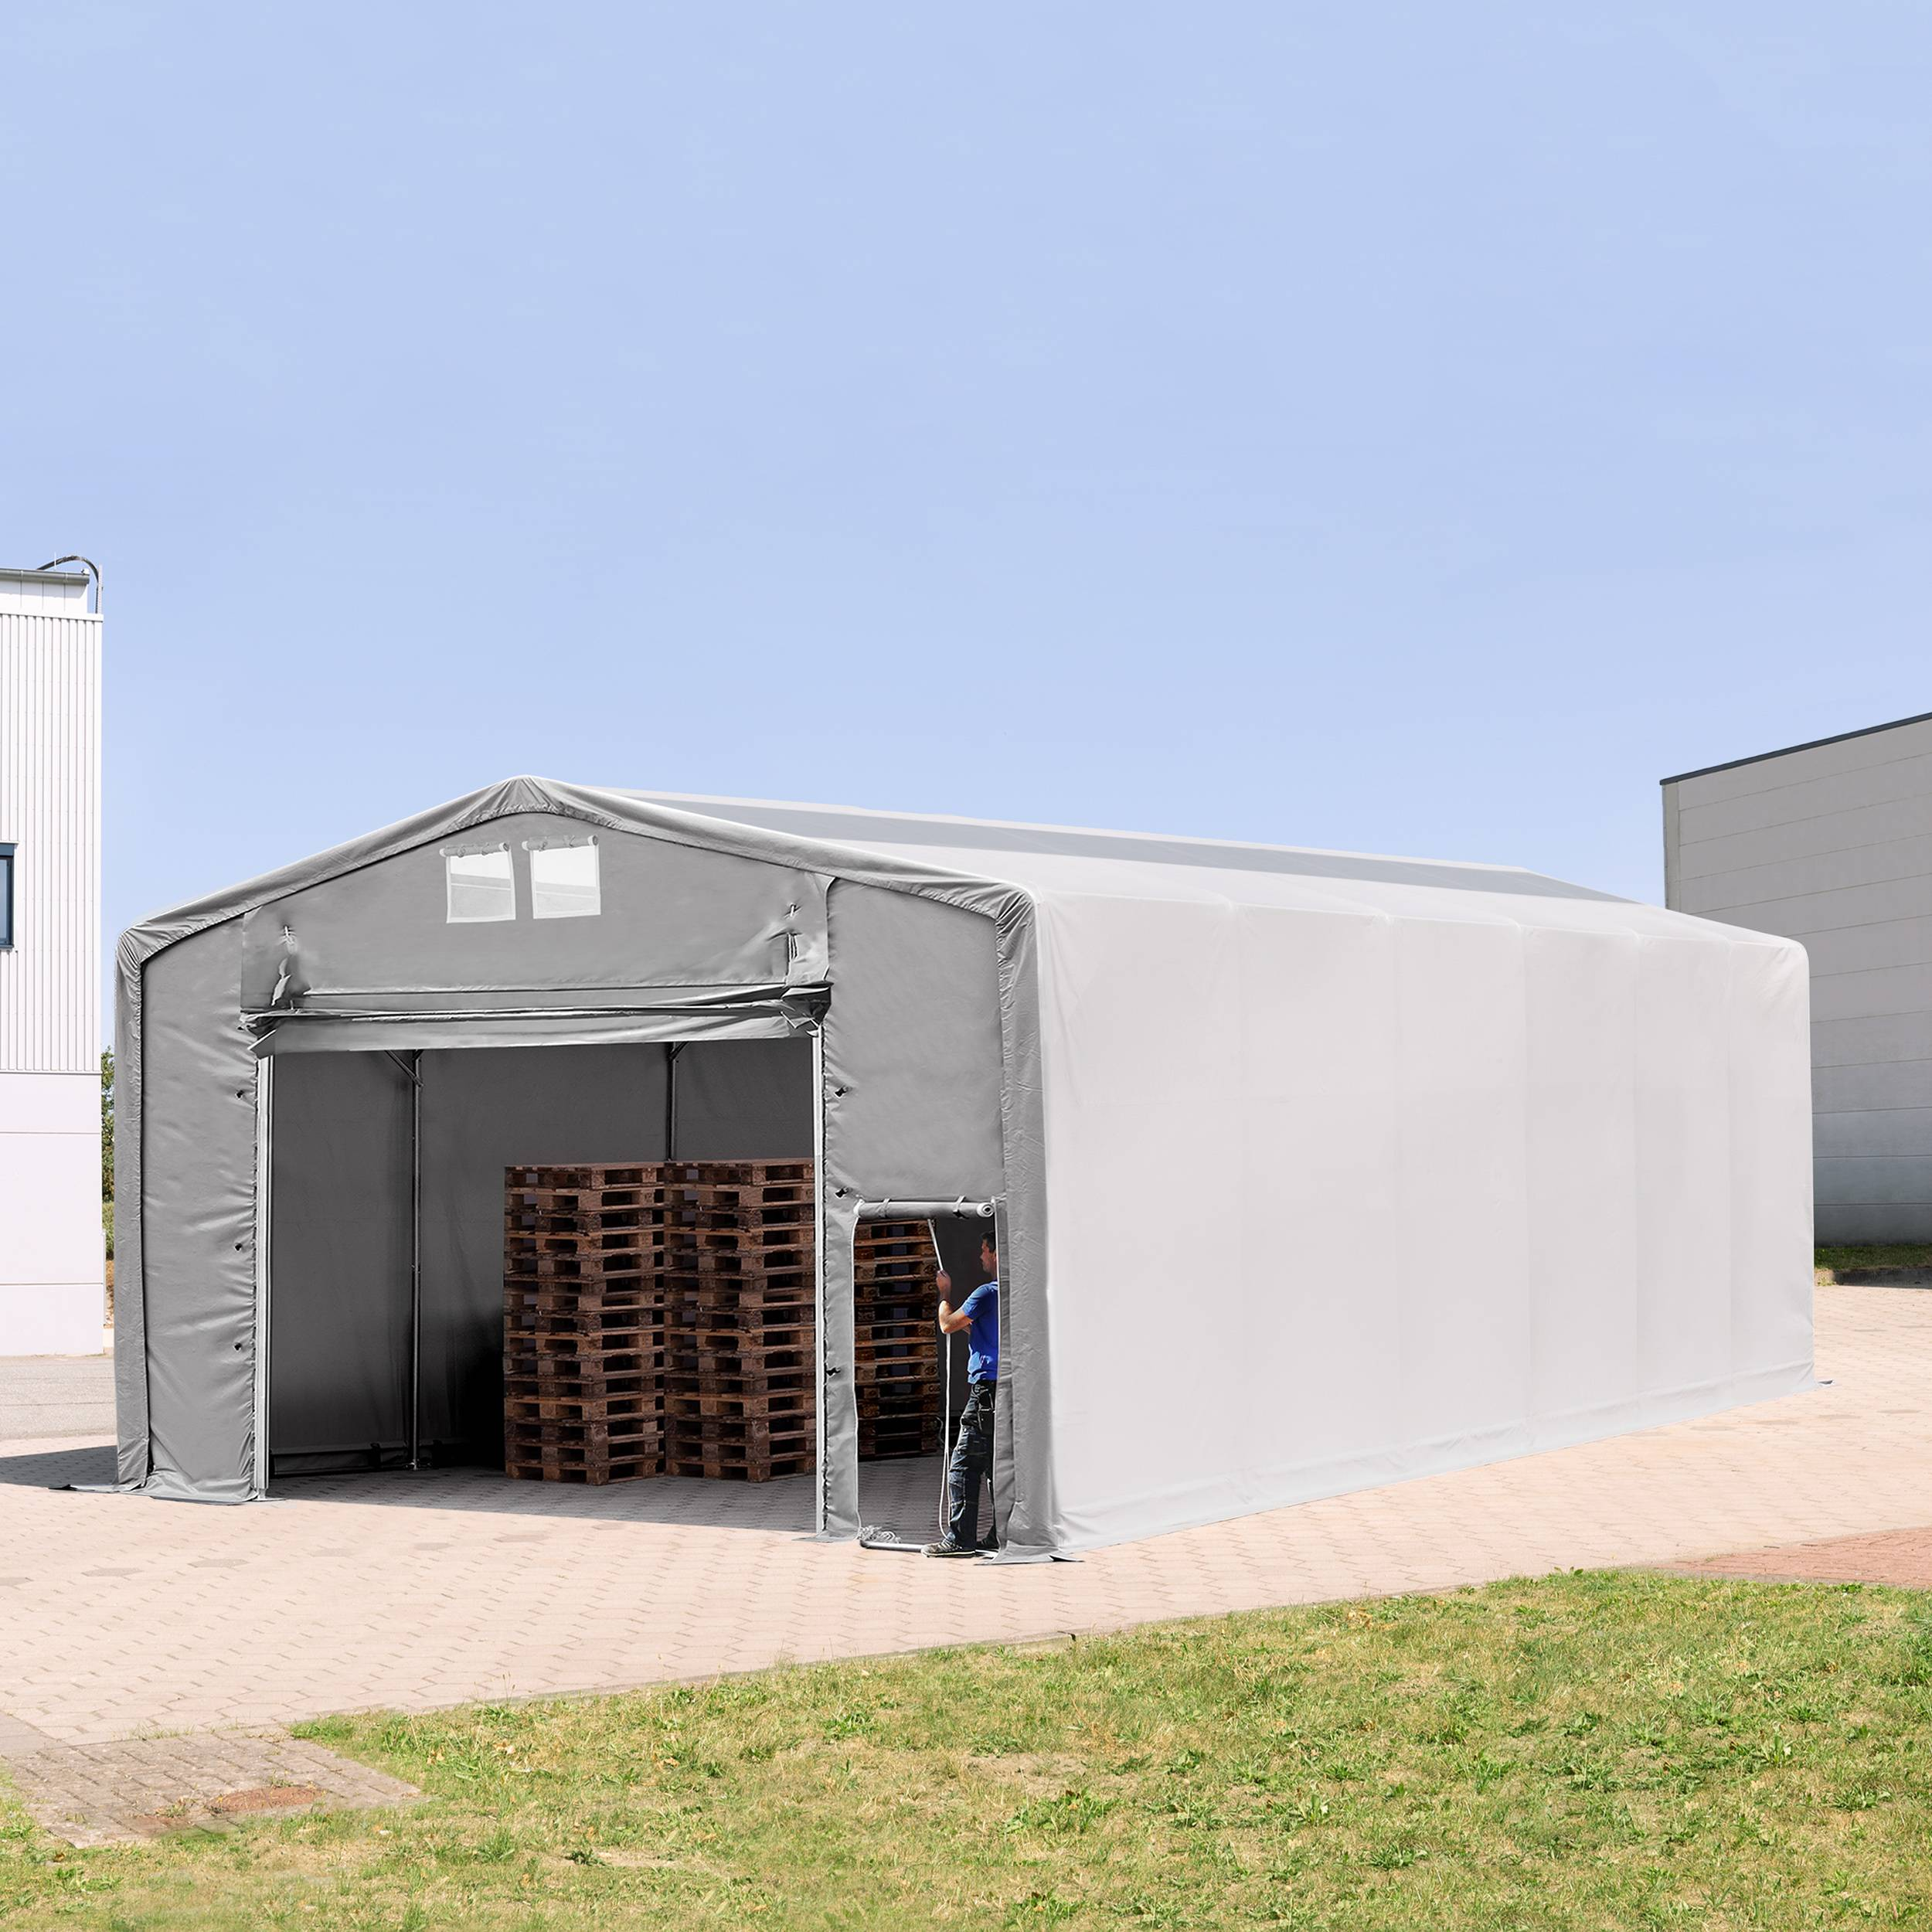 TOOLPORT Industrial Tent 8x12m PVC 720 g/m² grey waterproof